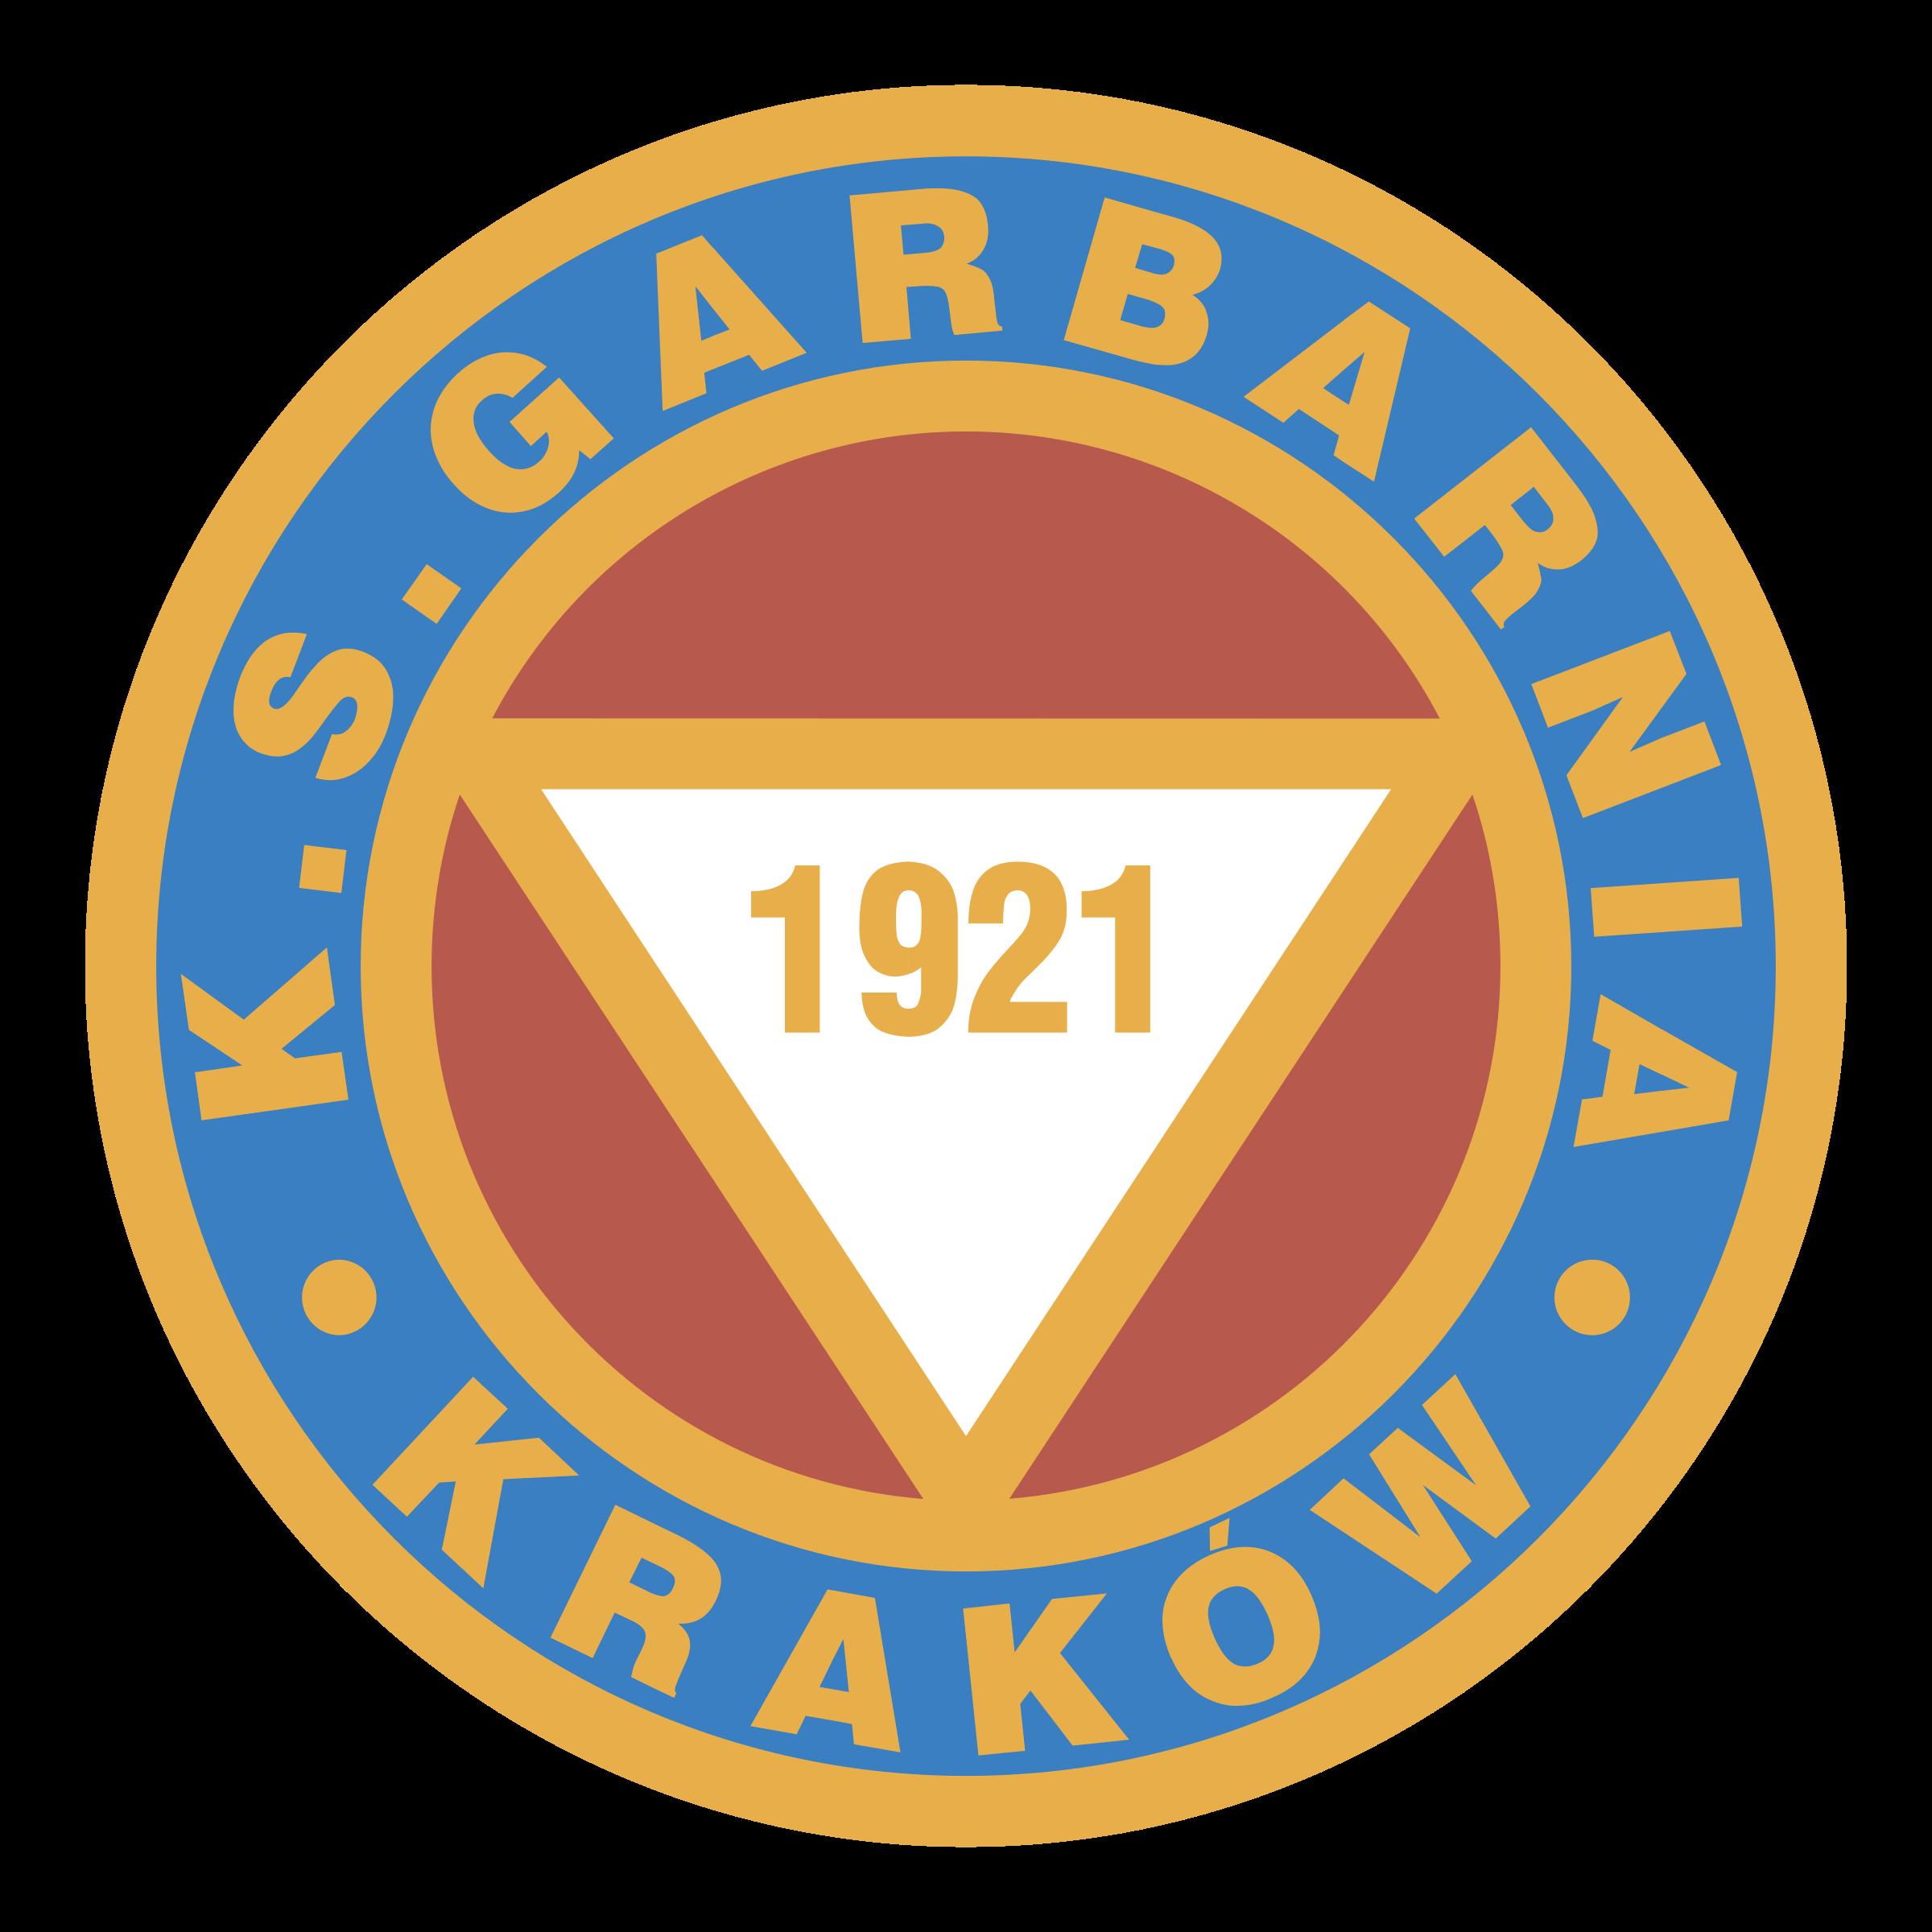 Ks Garbarnia Krakow Logo Png Transparent